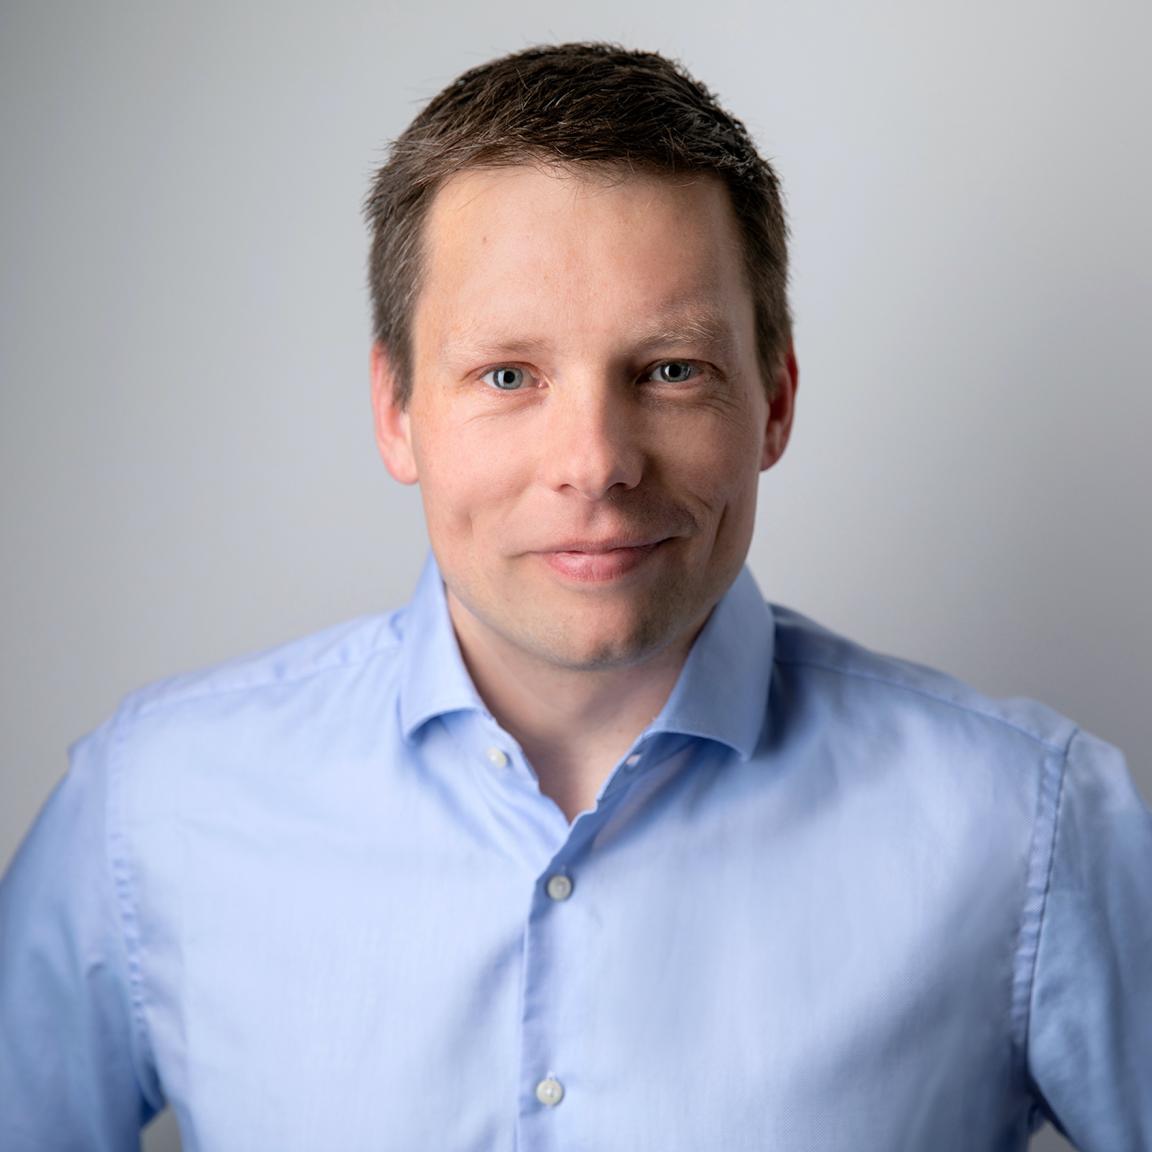 Stephan Schulze